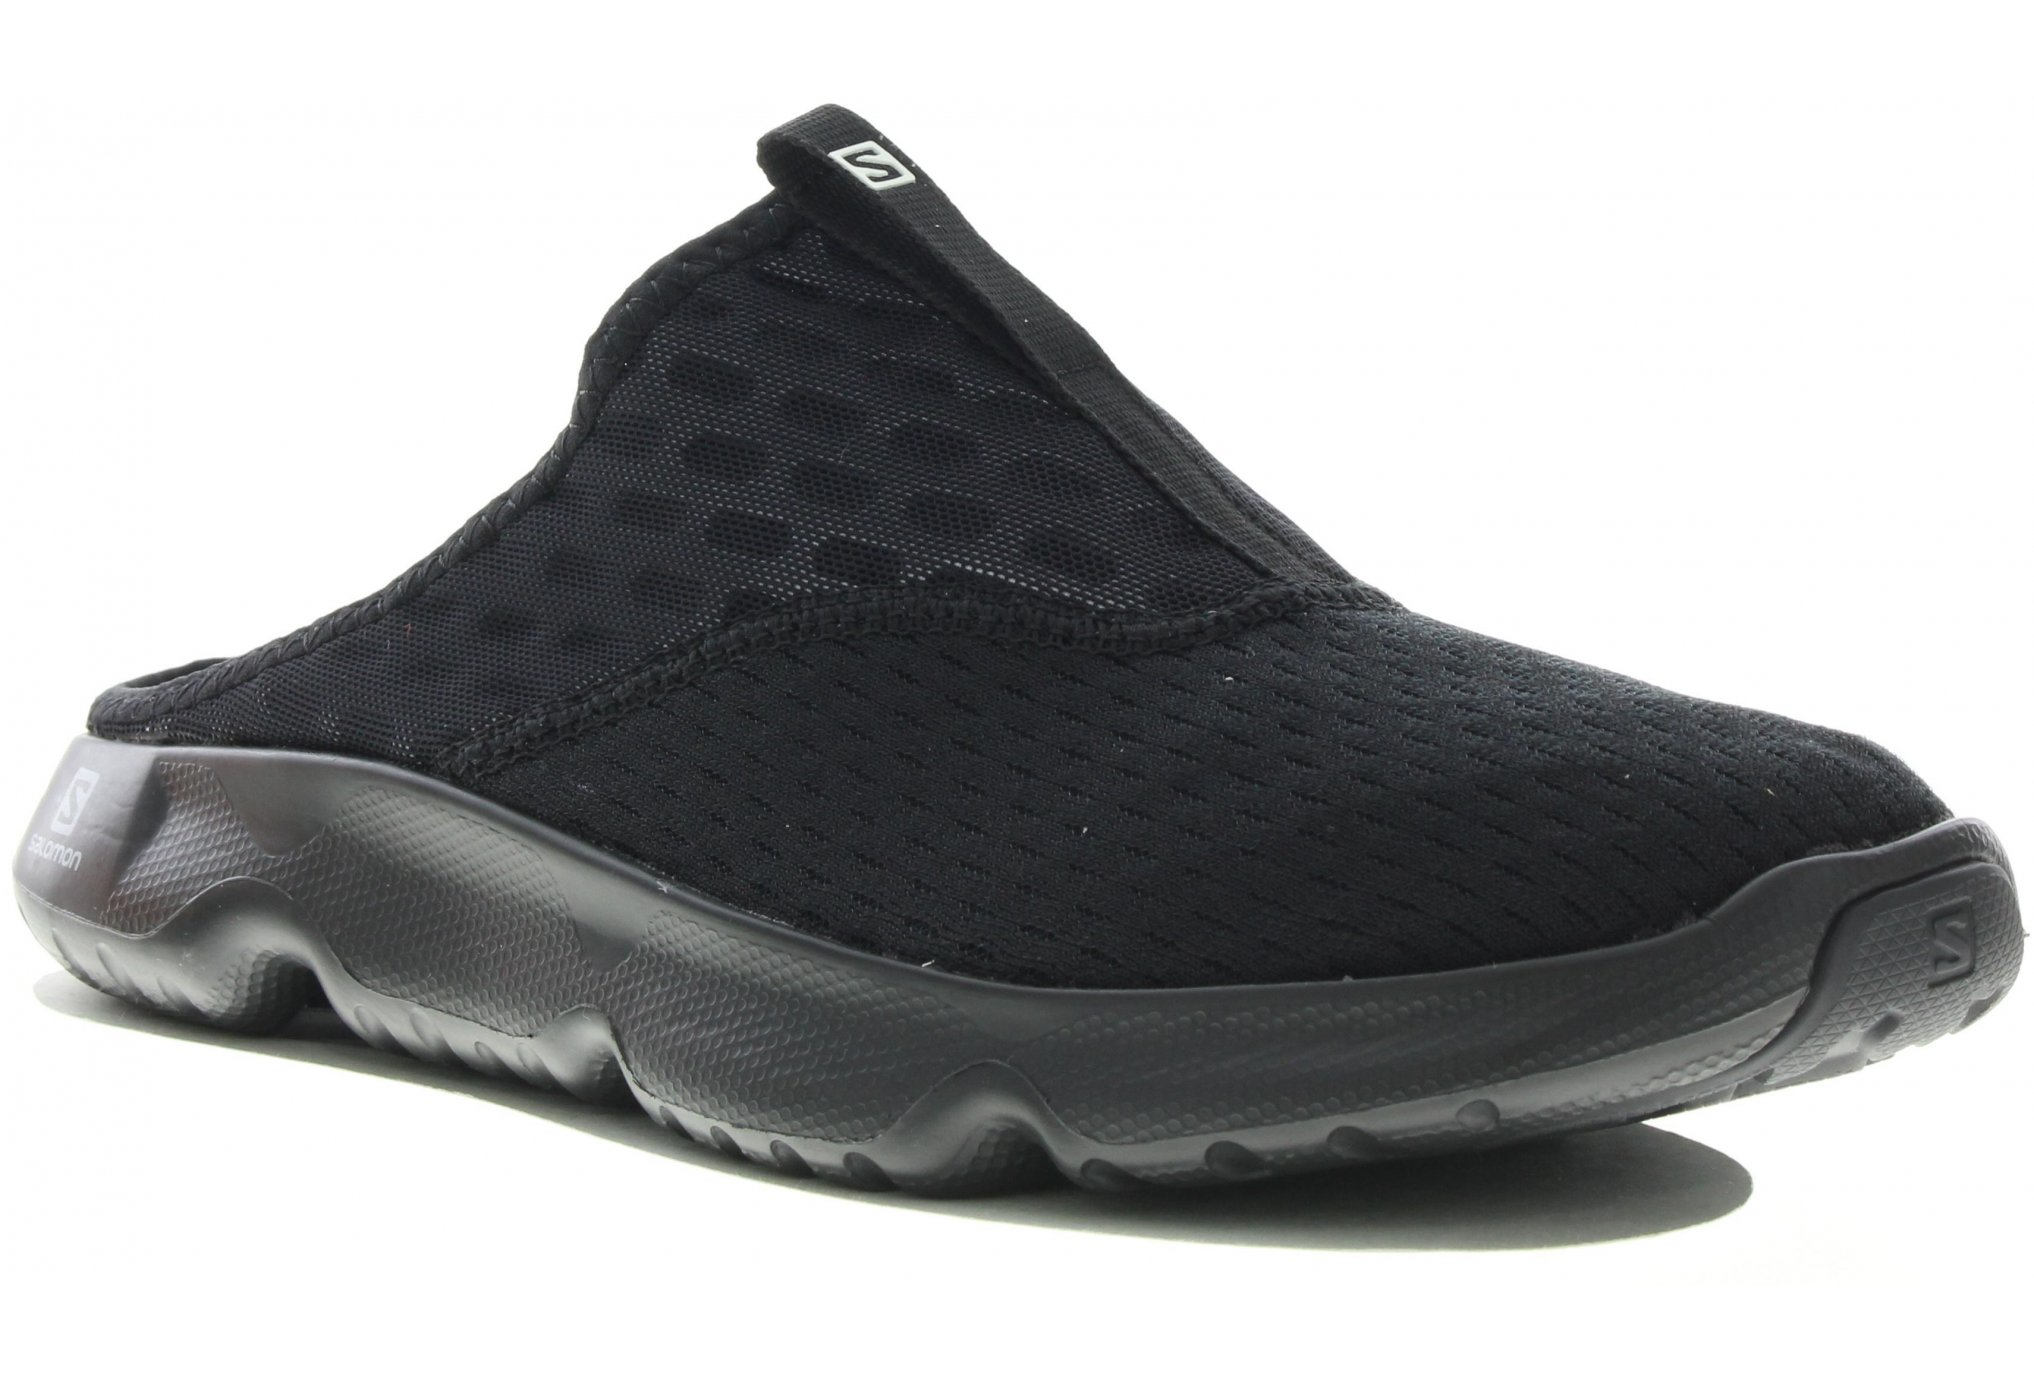 Salomon Reelax Slide 5.0 W Chaussures running femme